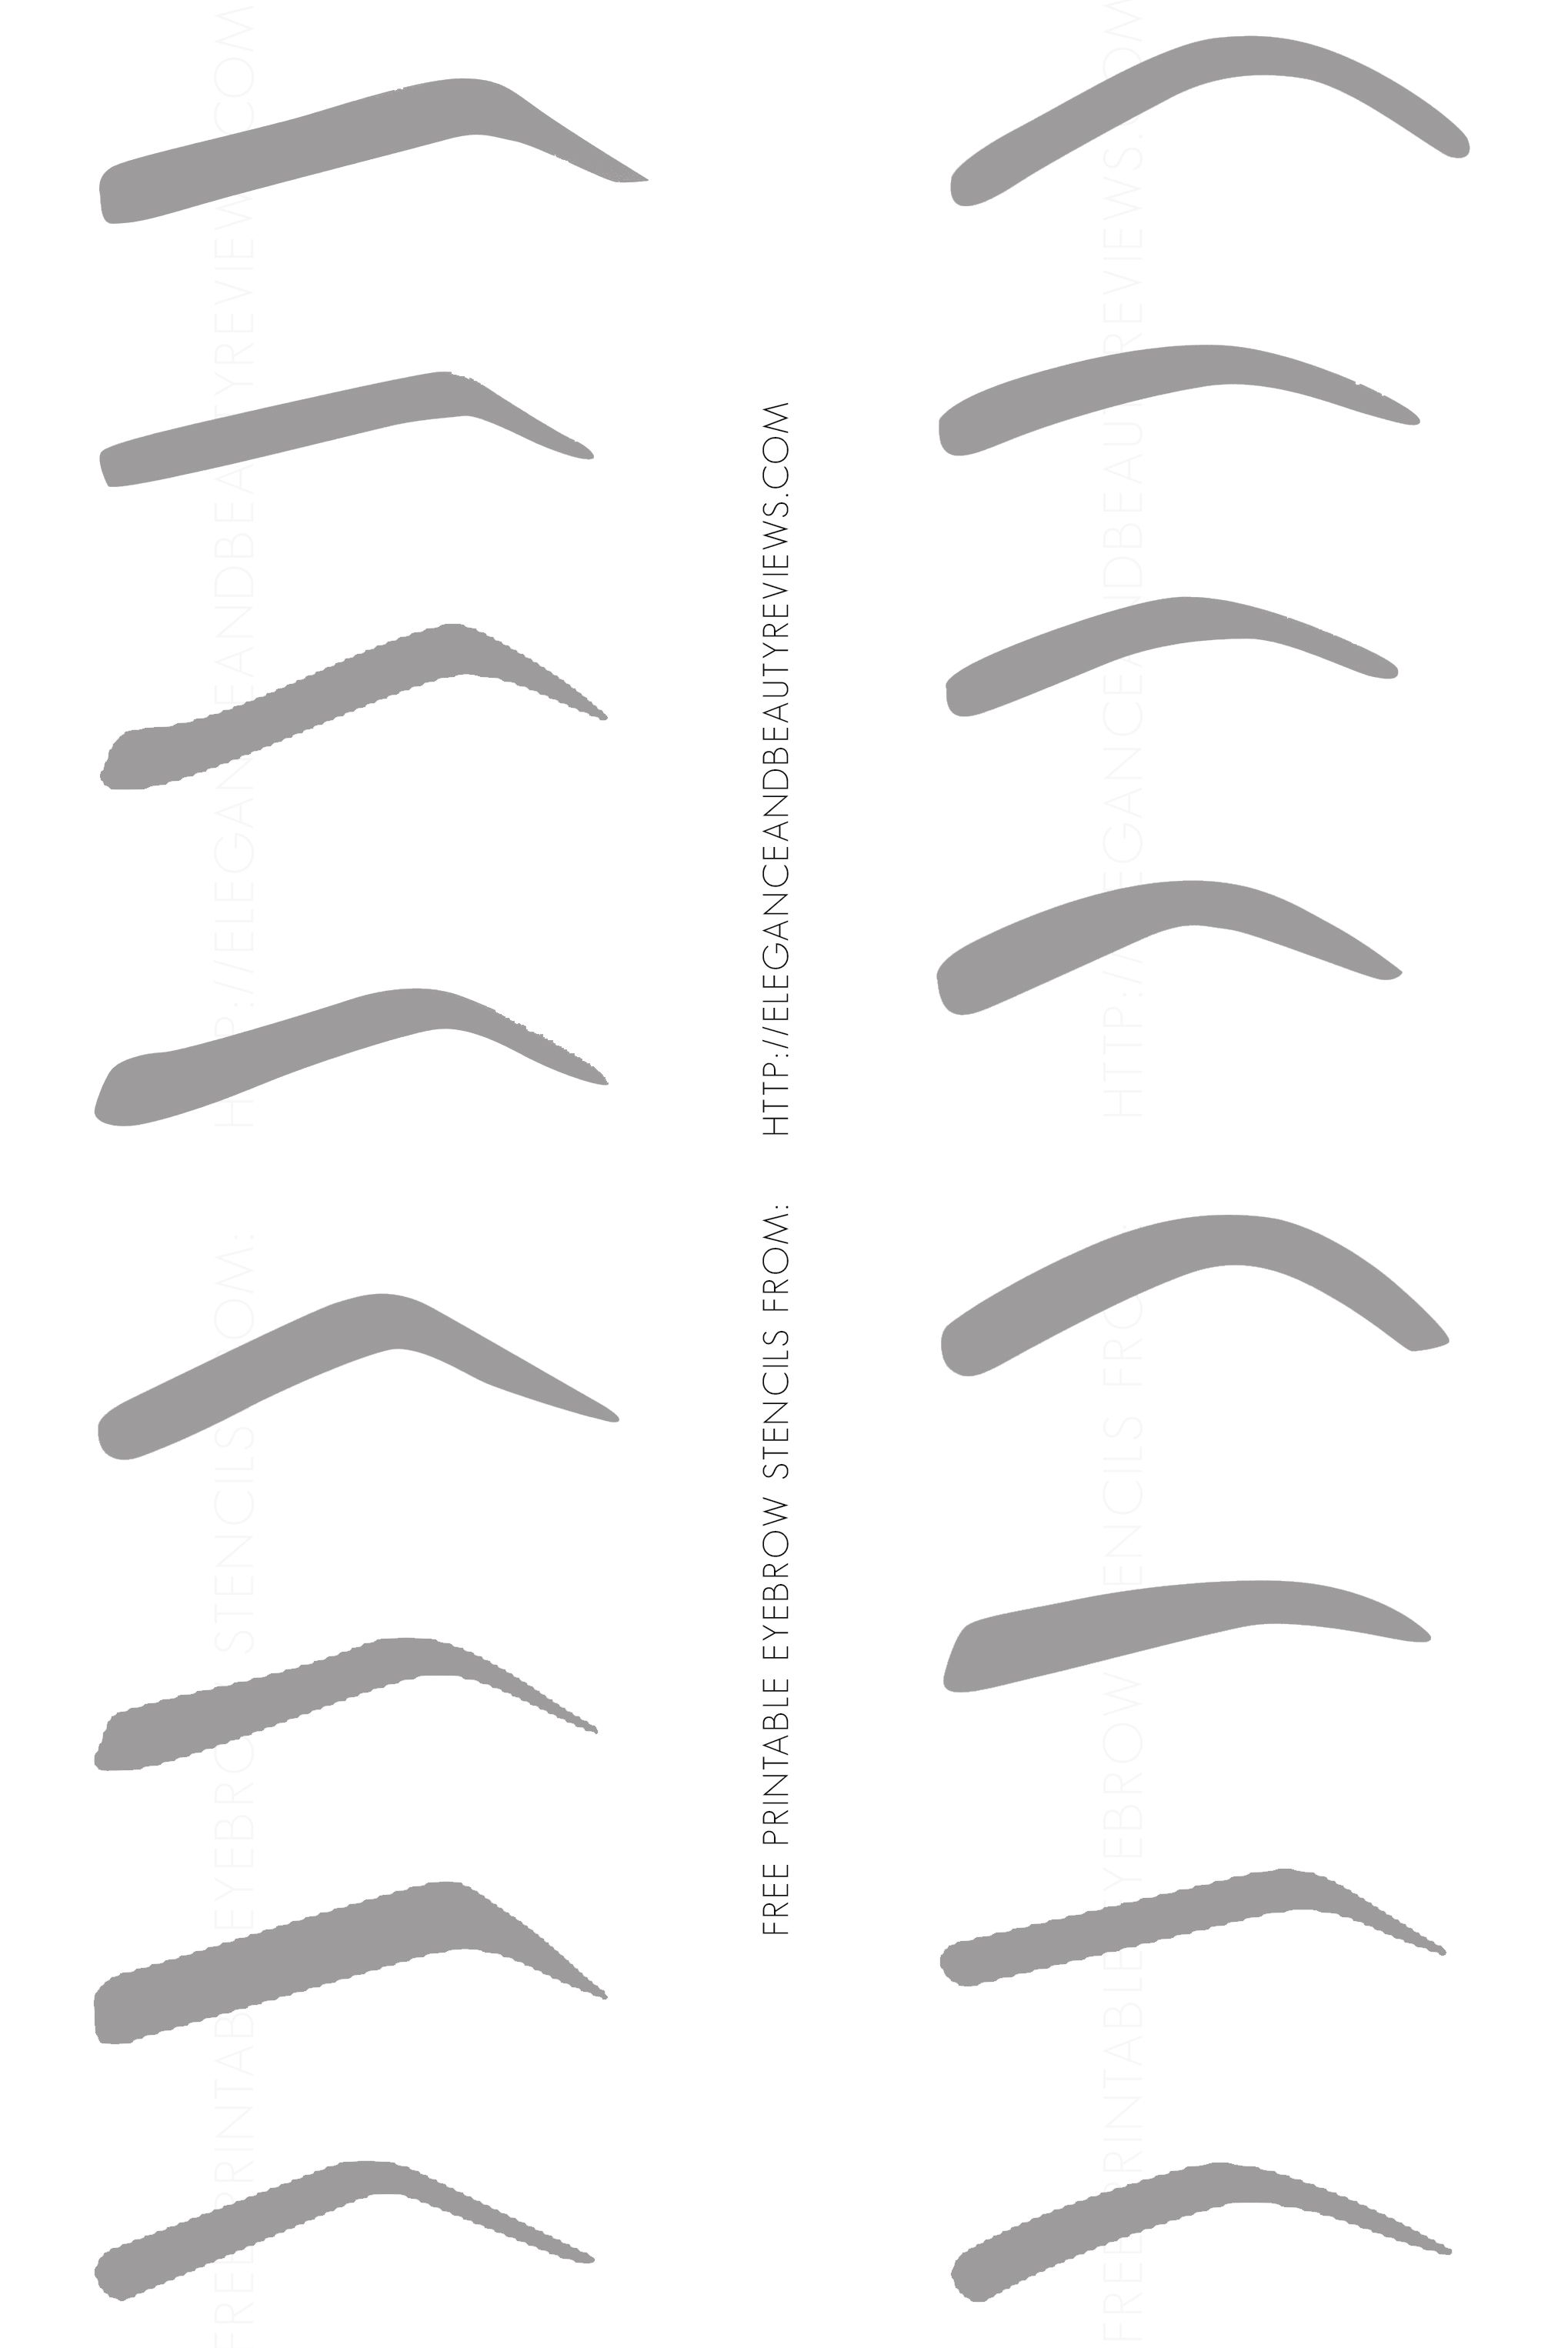 Printable eyebrow stencil template eyebrow printable for Printable eyebrow stencil template